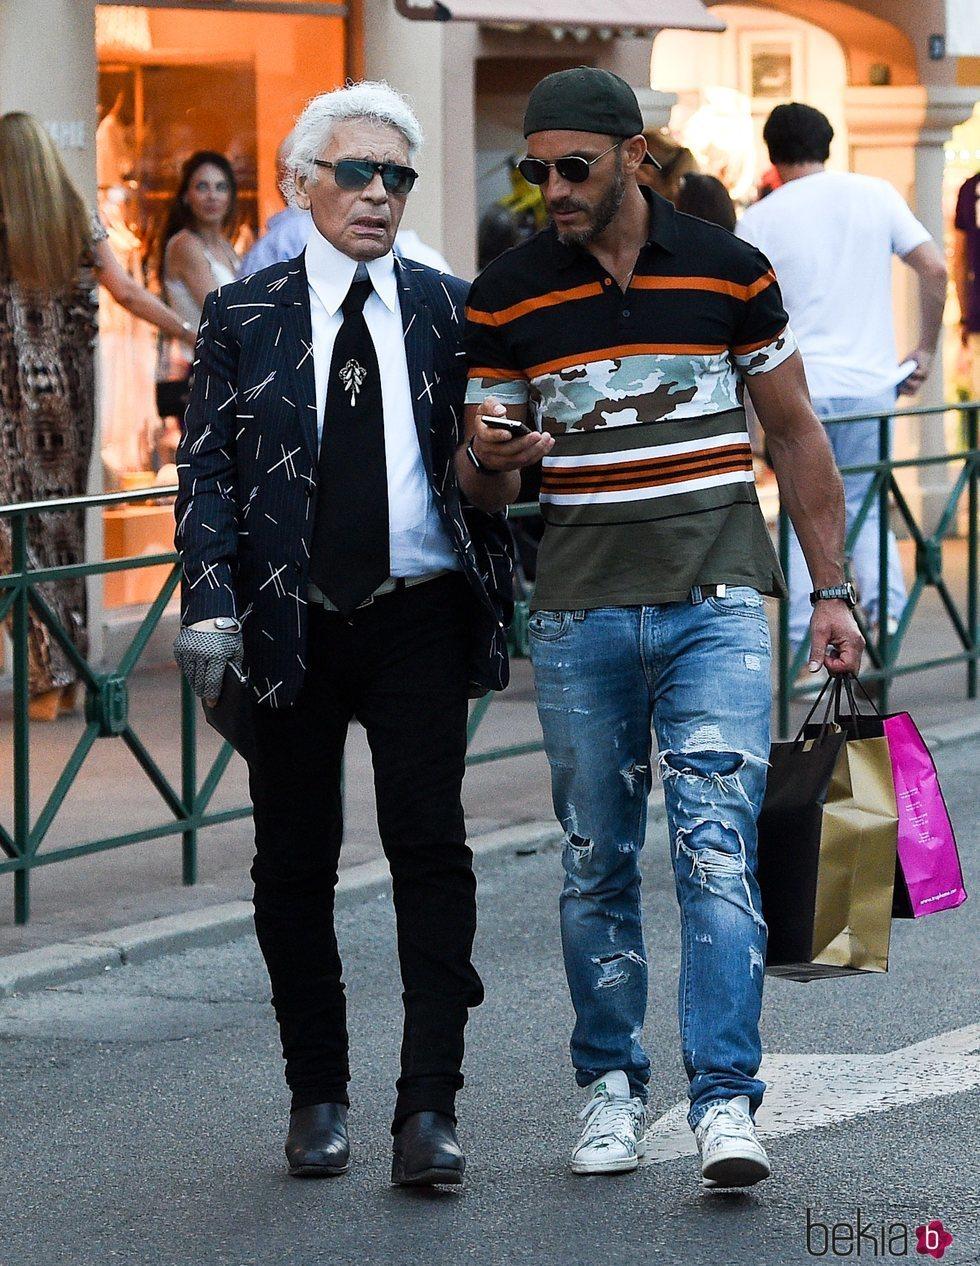 Karl Lagerfeld y Sébastien Jondeau